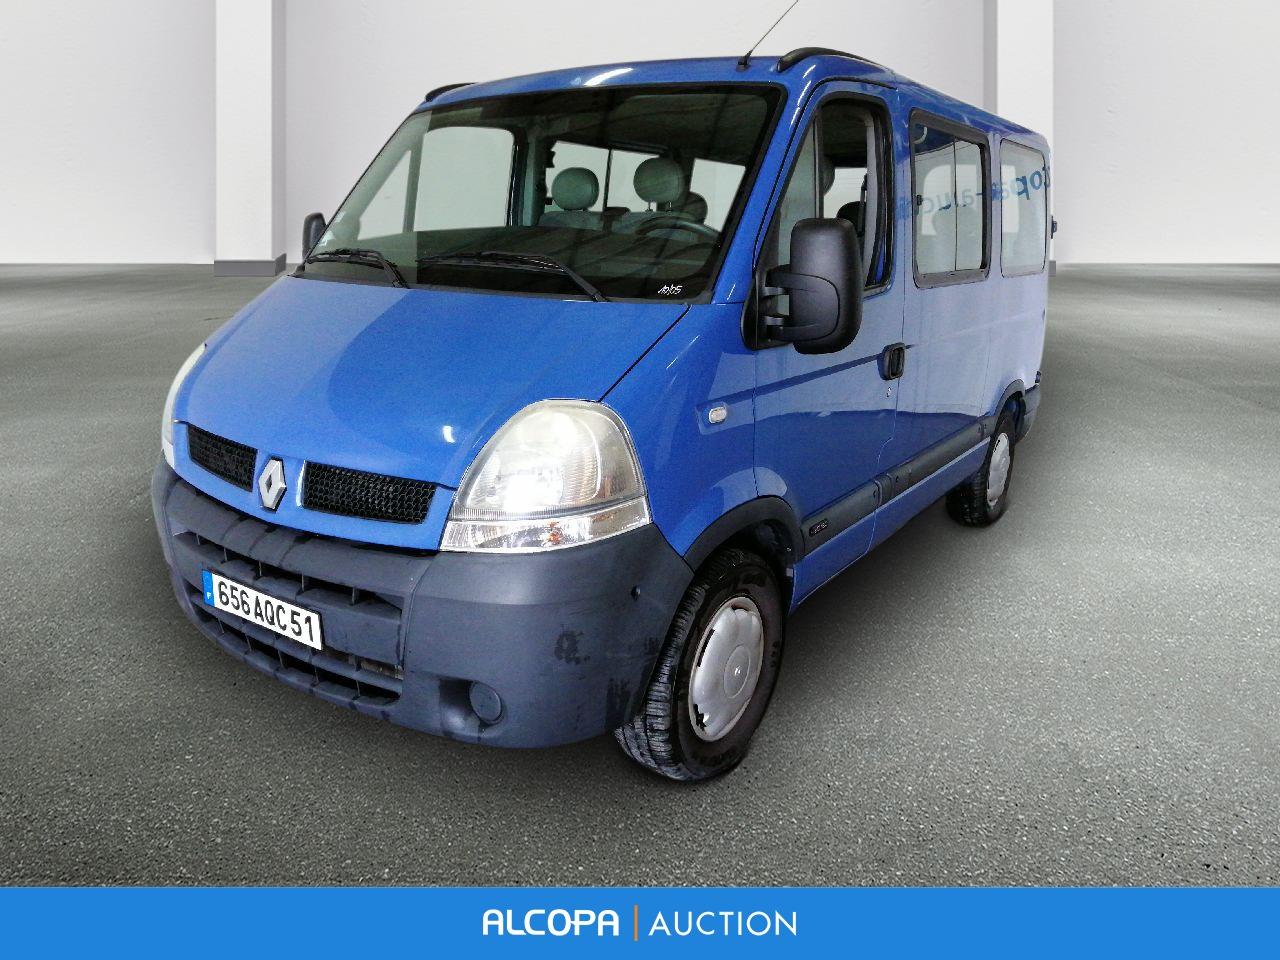 renault master minibus master minibus l1h1 2 5 dci 120 3 2t alcopa auction. Black Bedroom Furniture Sets. Home Design Ideas